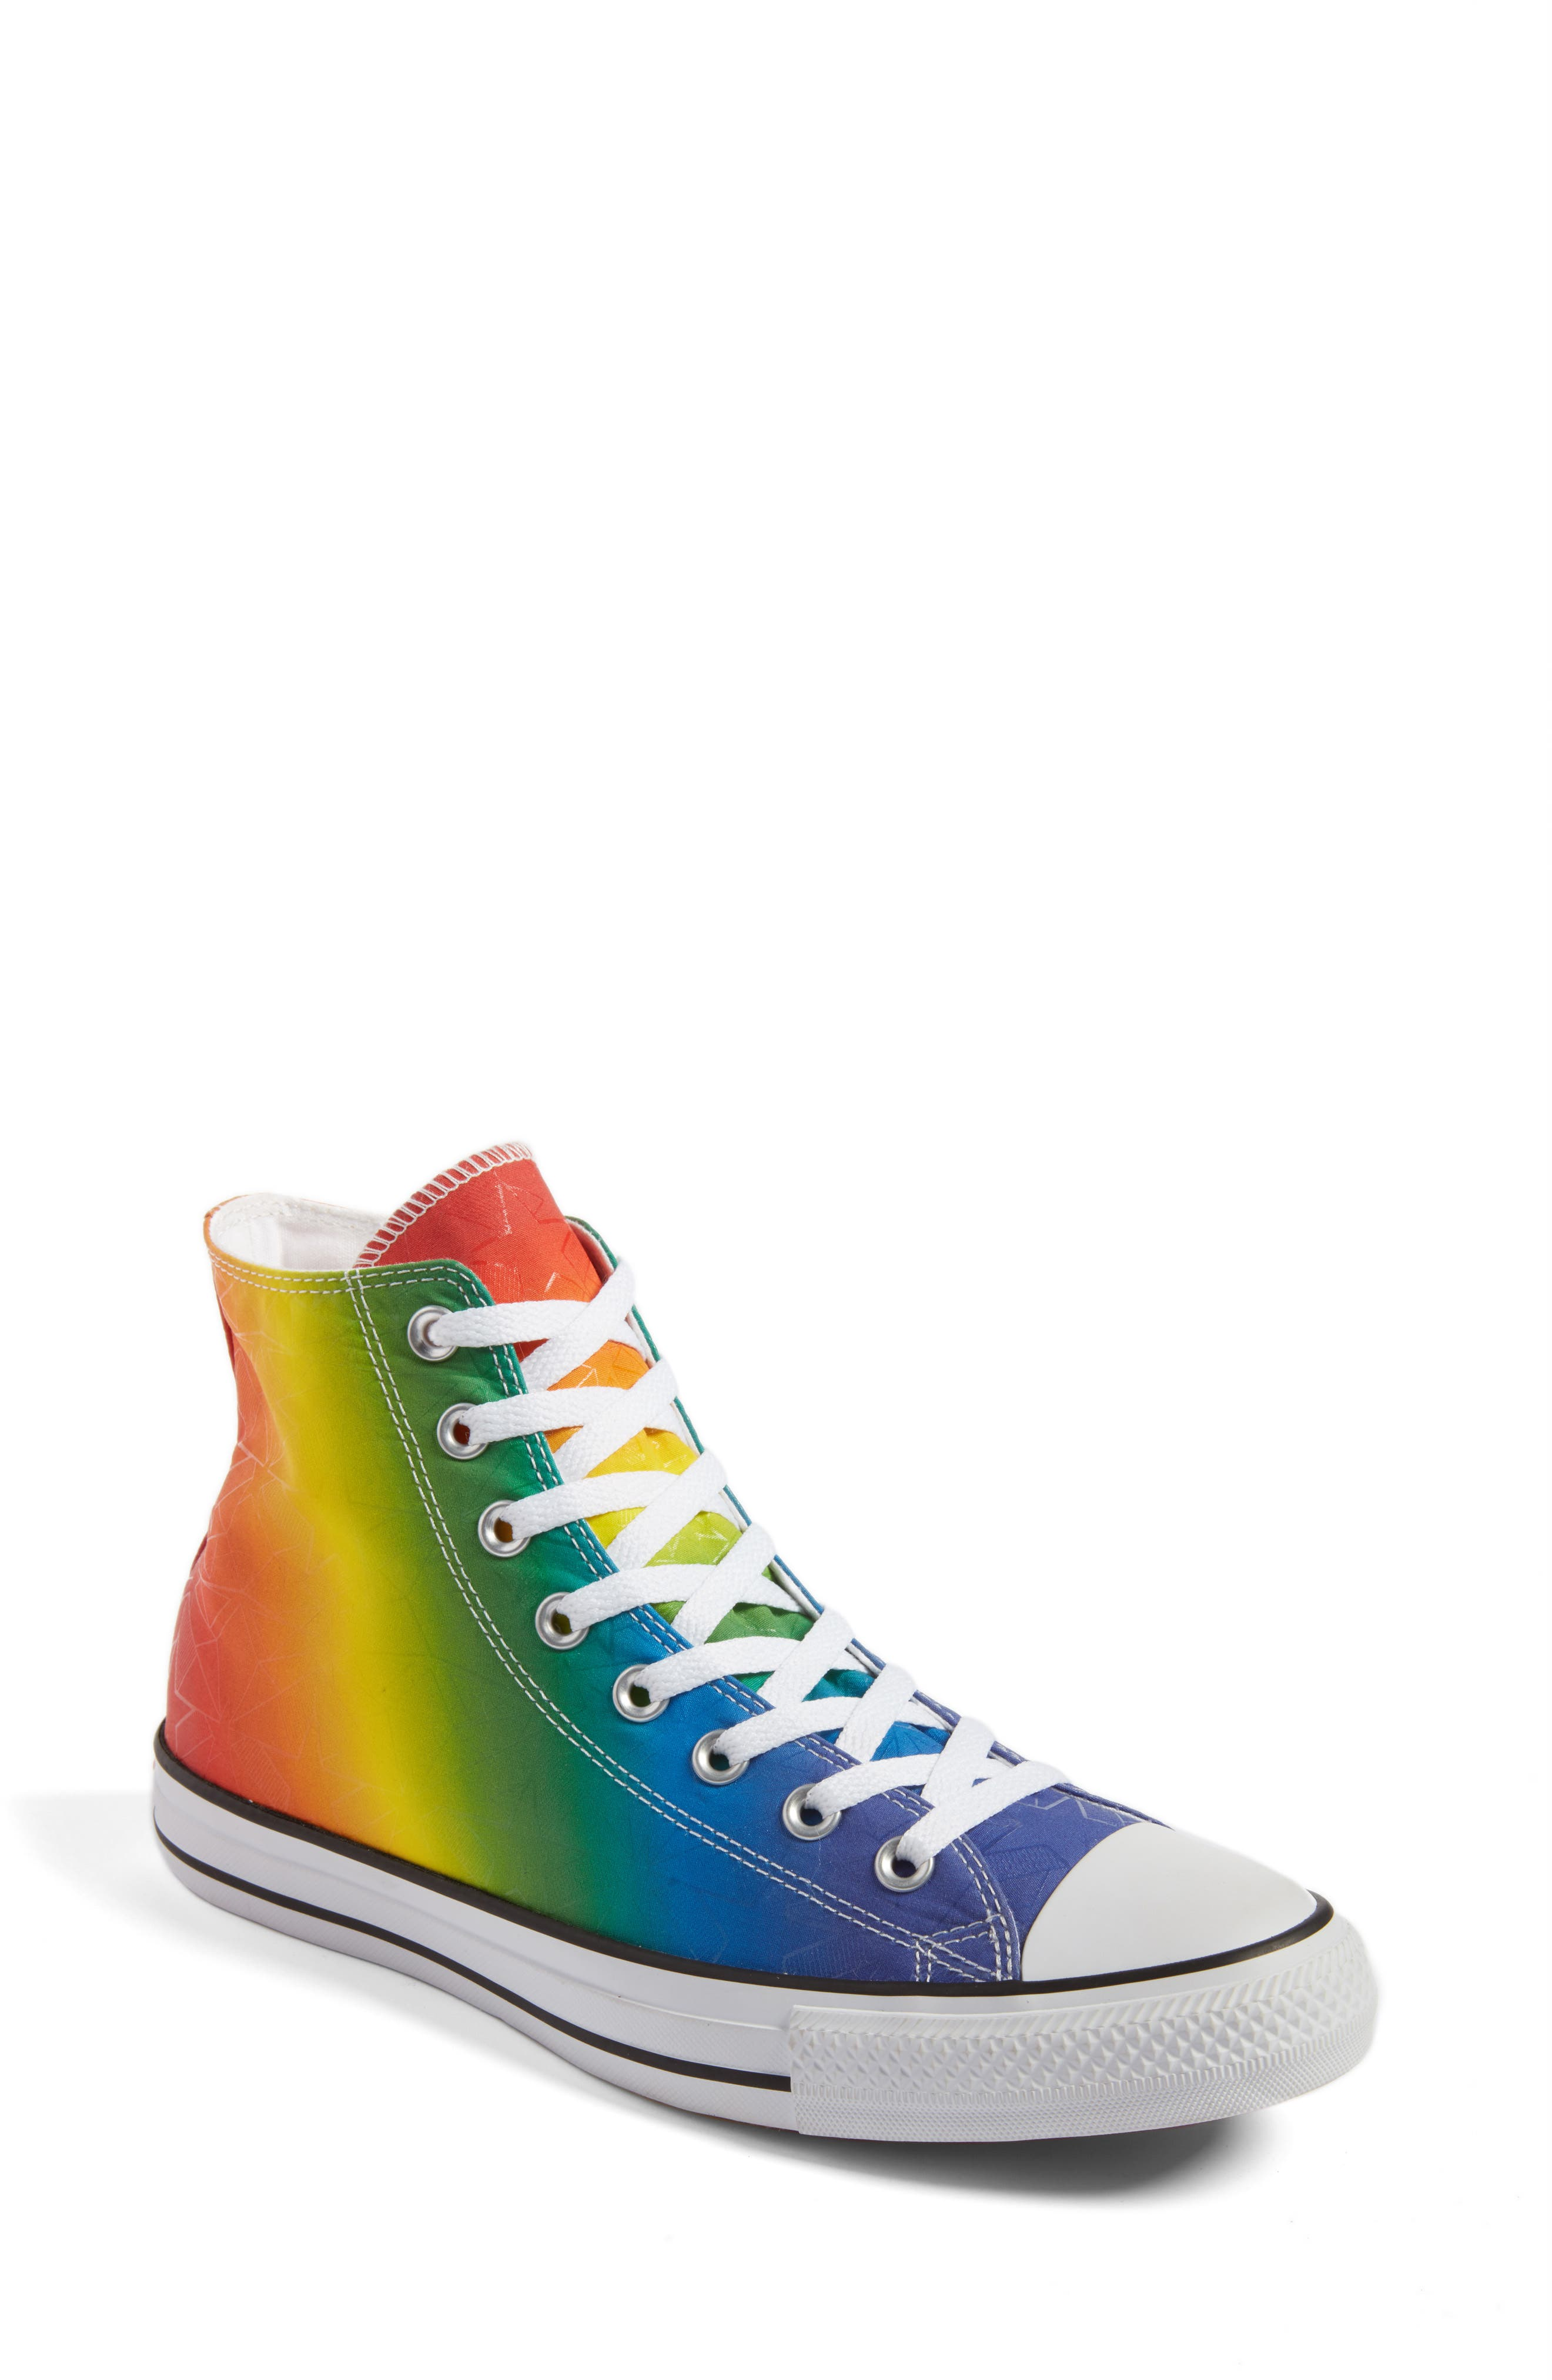 Chuck Taylor<sup>®</sup> All Star<sup>®</sup> Pride High Top Sneaker,                             Main thumbnail 1, color,